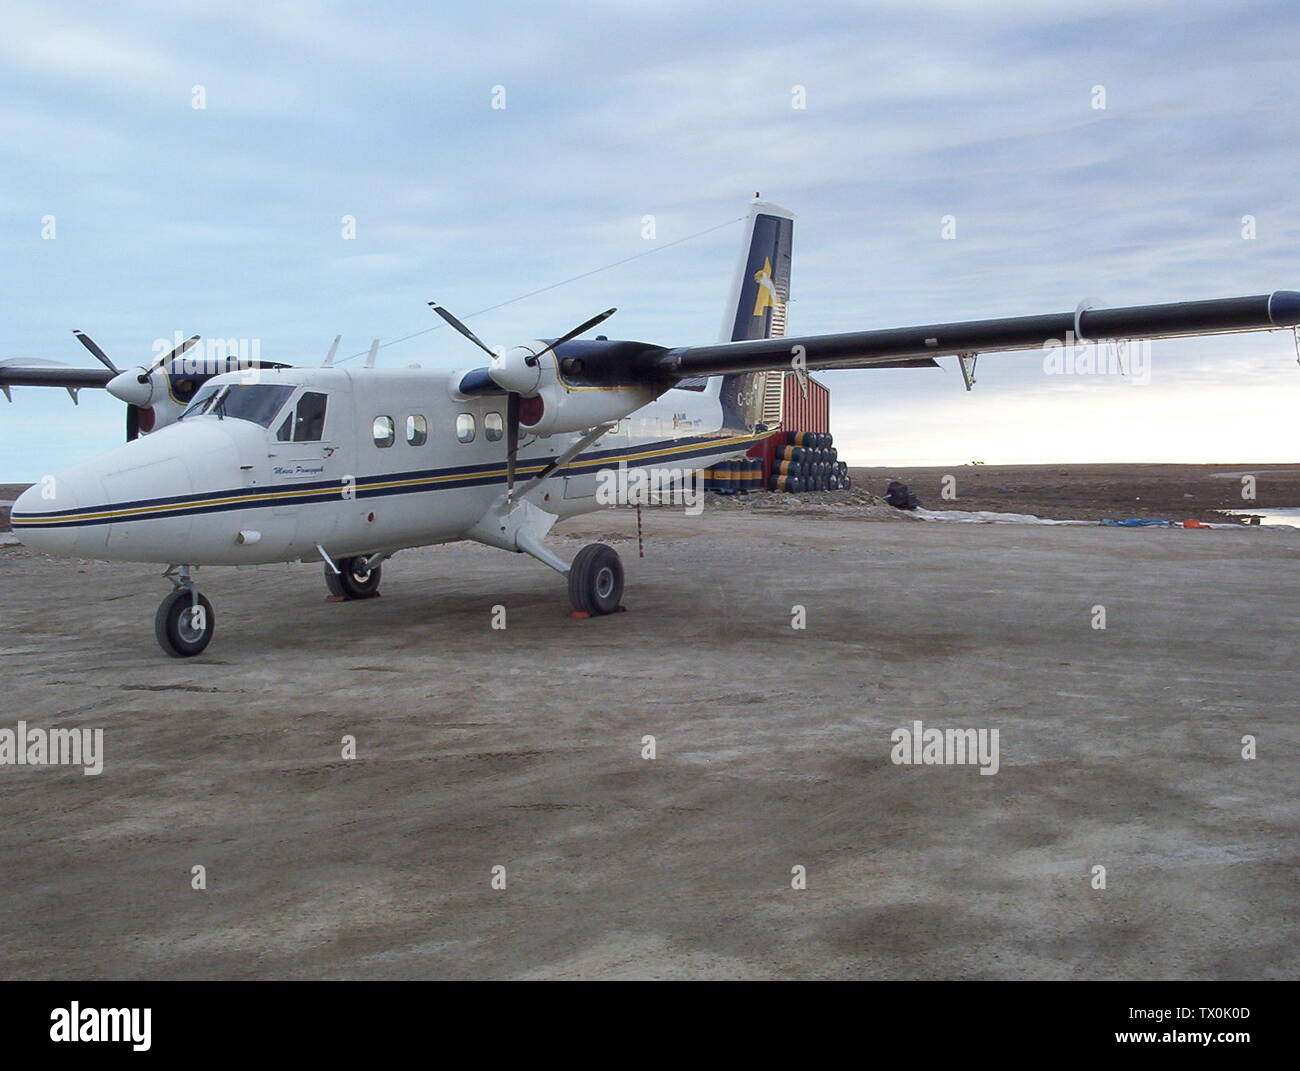 'English: C-GFYN Adlair Aviation Ltd. de Havilland Twin Otter (DHC6) 200 Series at Cambridge Bay Airport, Nunavut, Canada.; 14 June 2005, 14:05; Own work; CambridgeBayWeather; ' - Stock Image